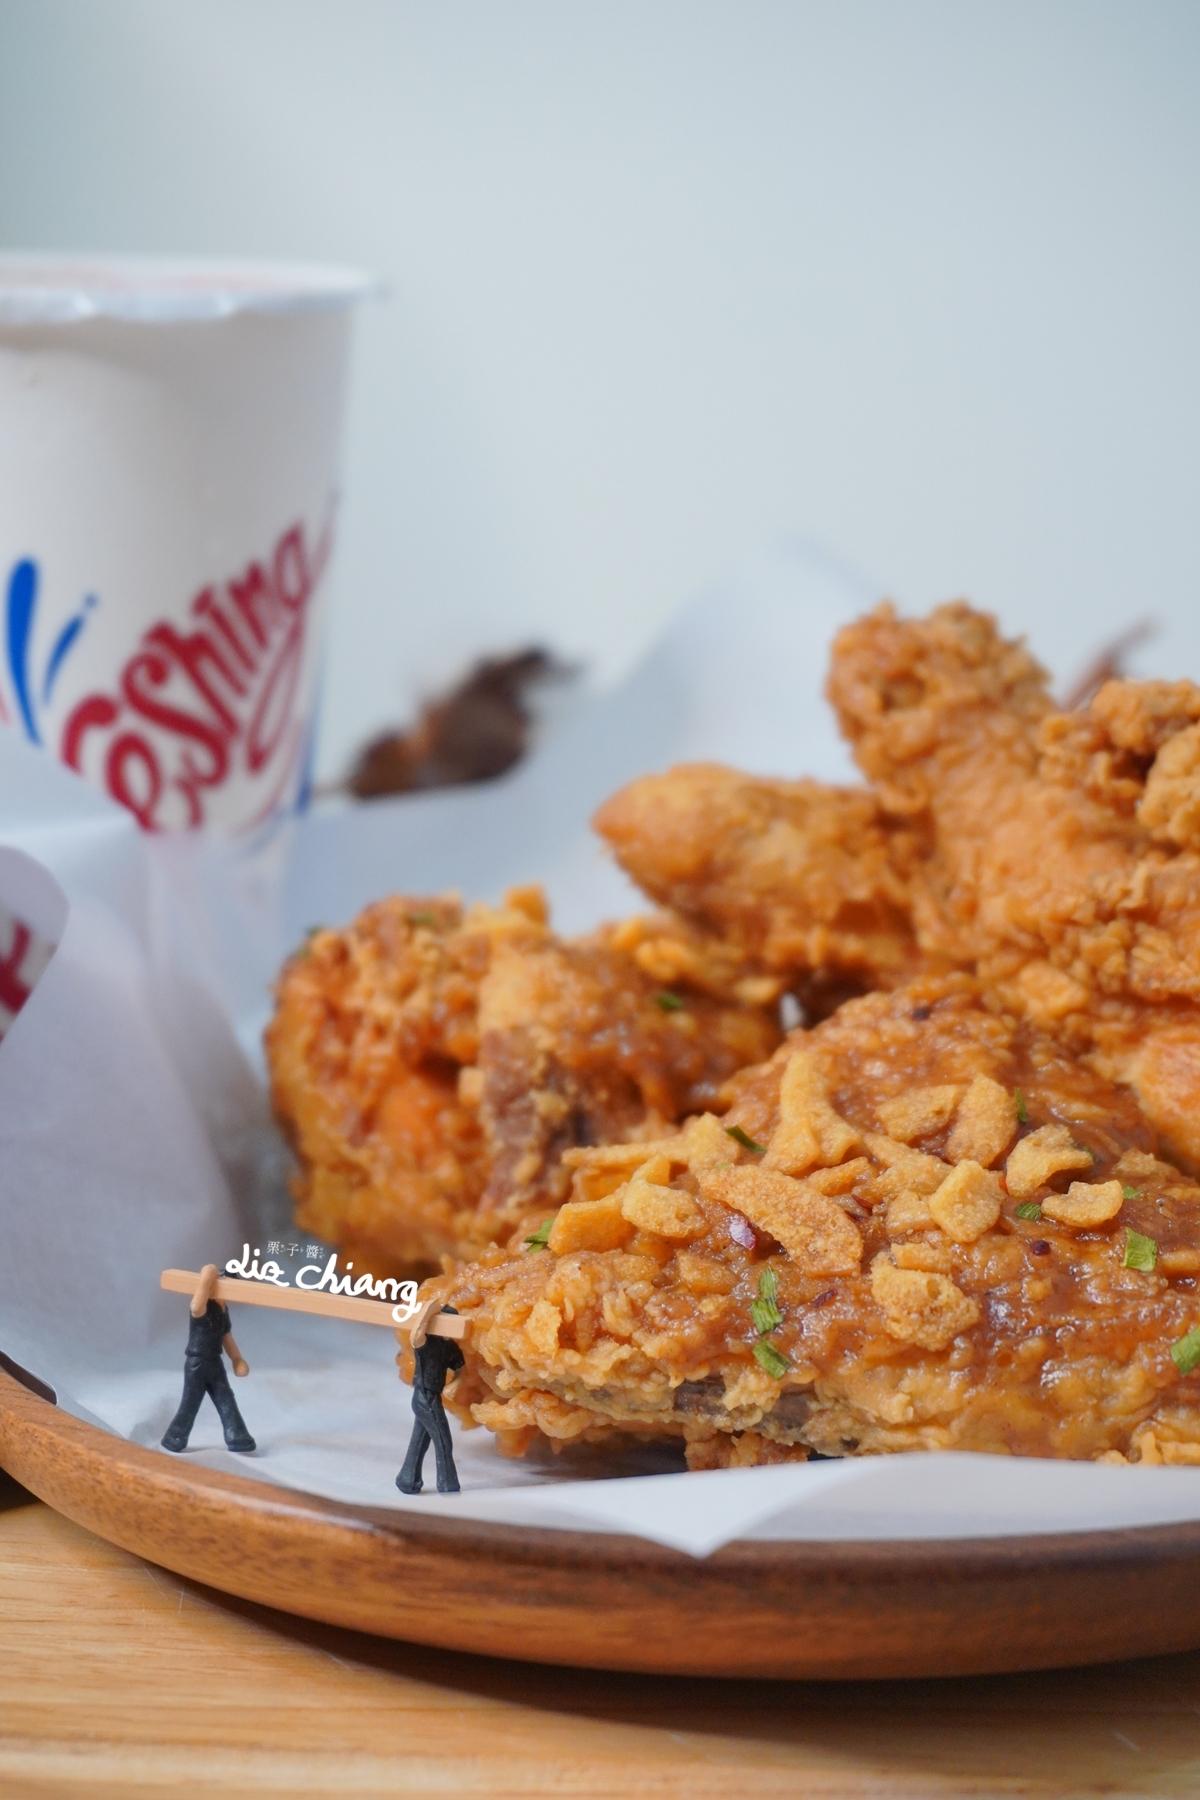 DSC07024Liz chiang 栗子醬-美食部落客-料理部落客